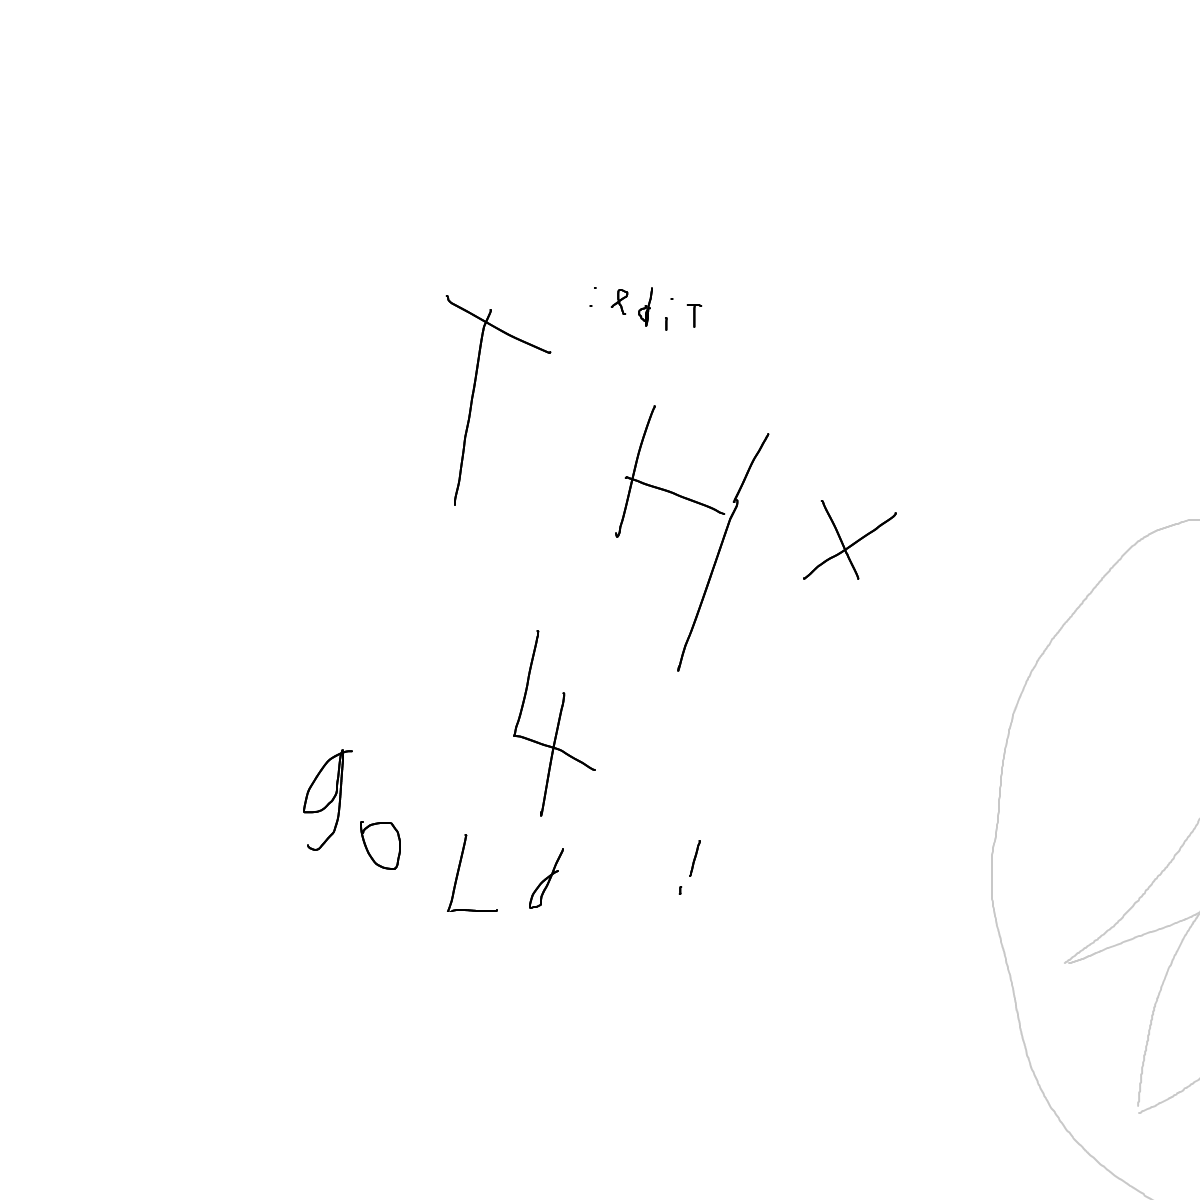 BAAAM drawing#6848 lat:-12.0500173568725590lng: -51.5039558410644500